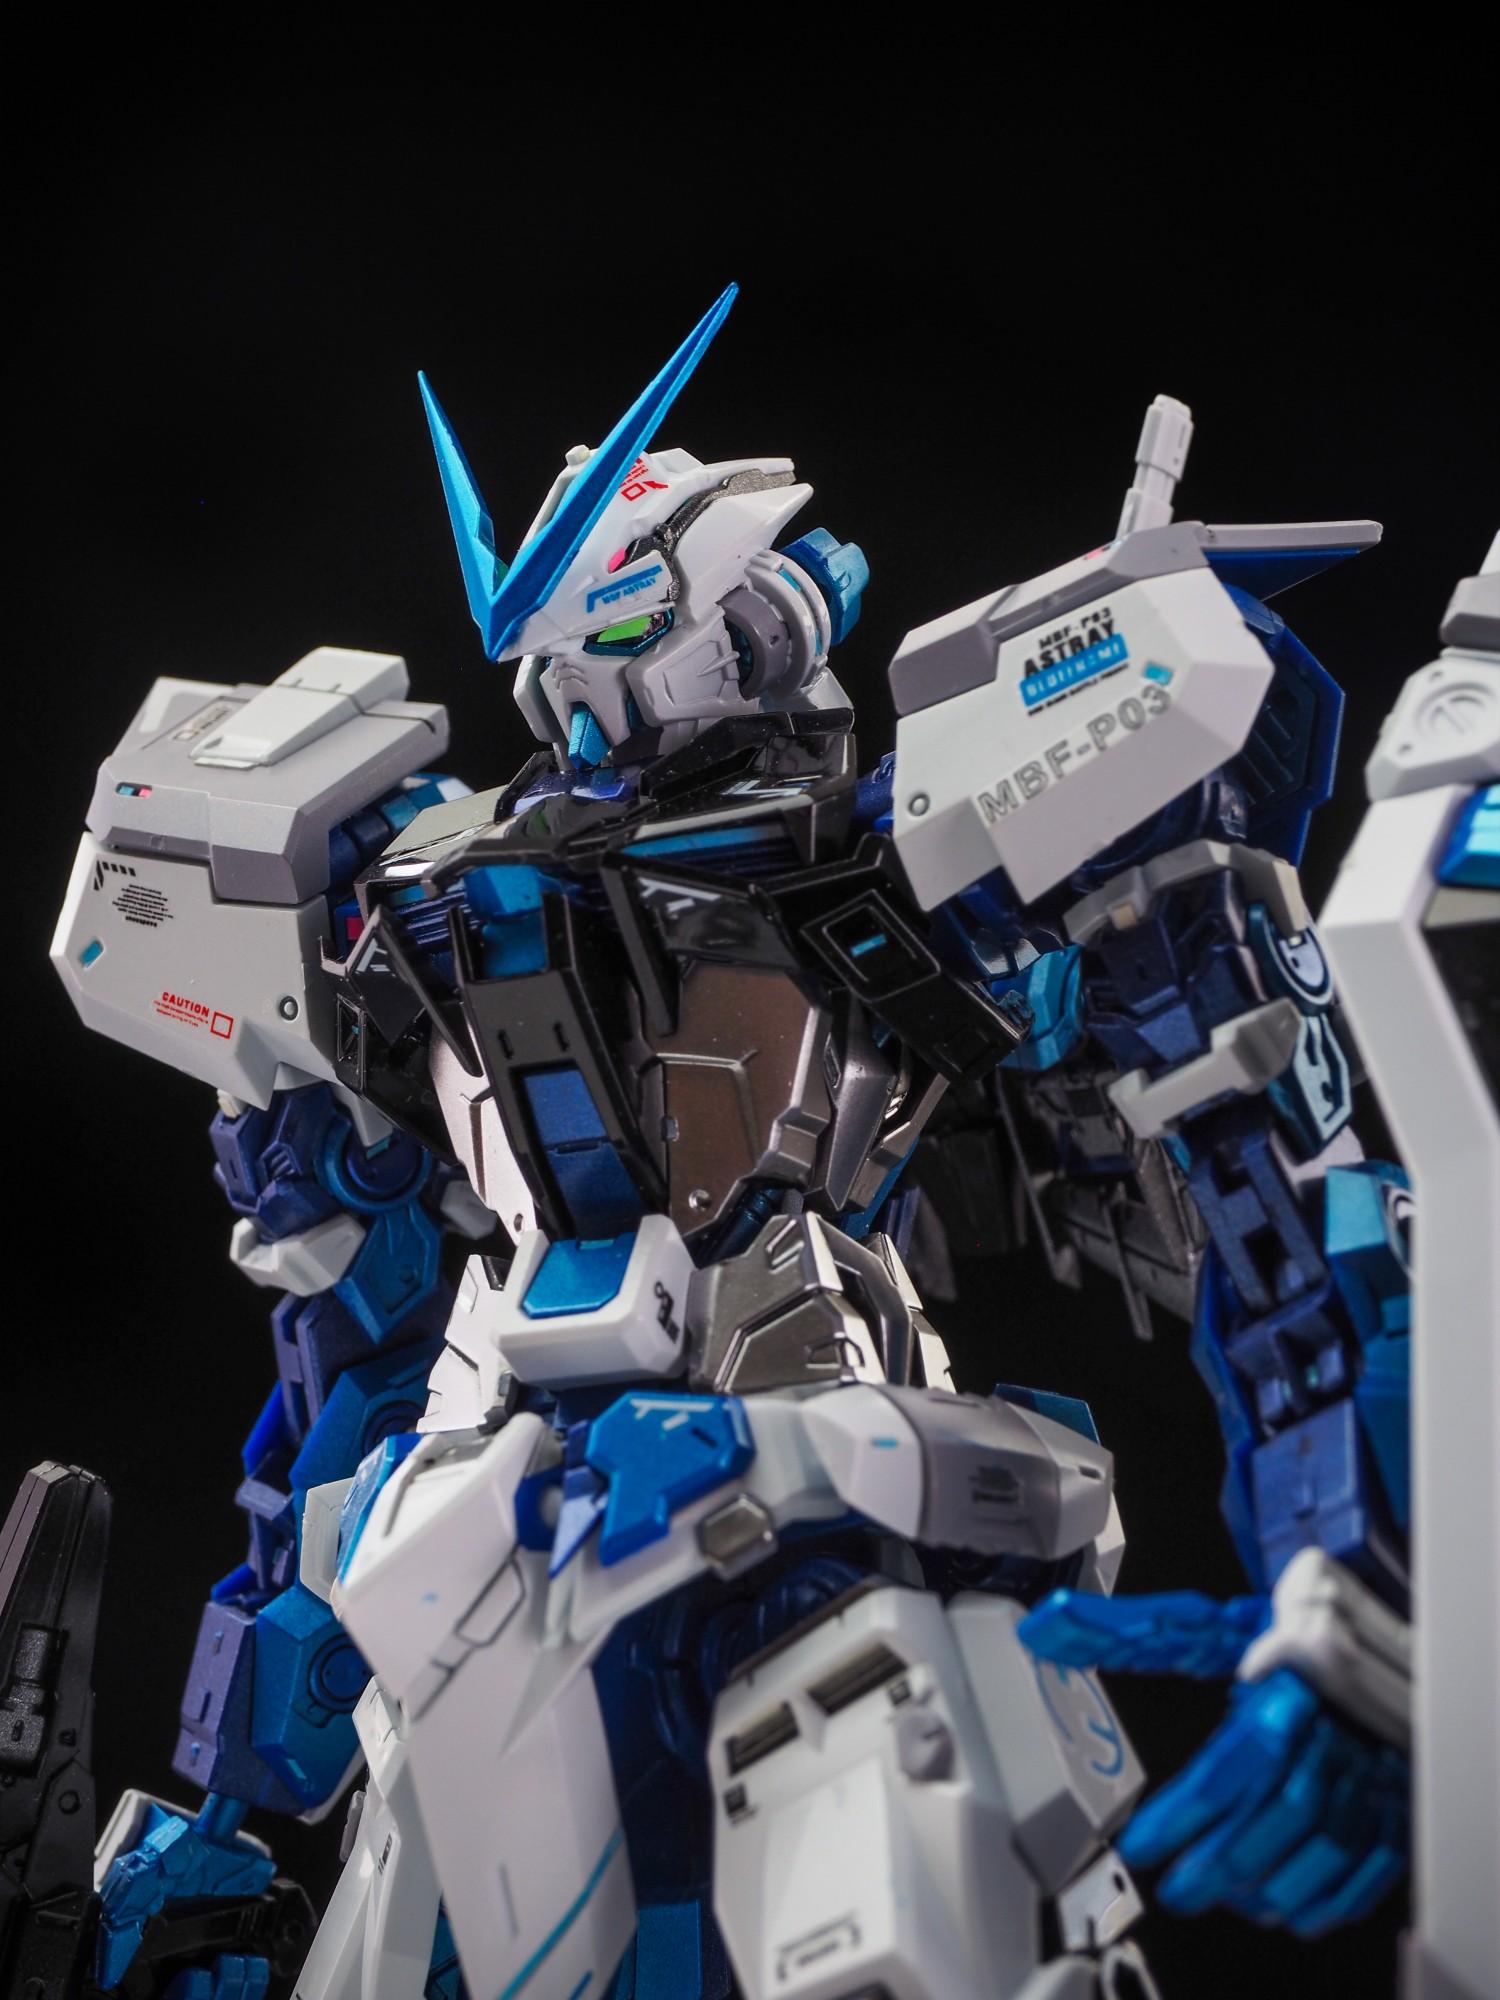 S367_8810_astray_blue_017.jpg